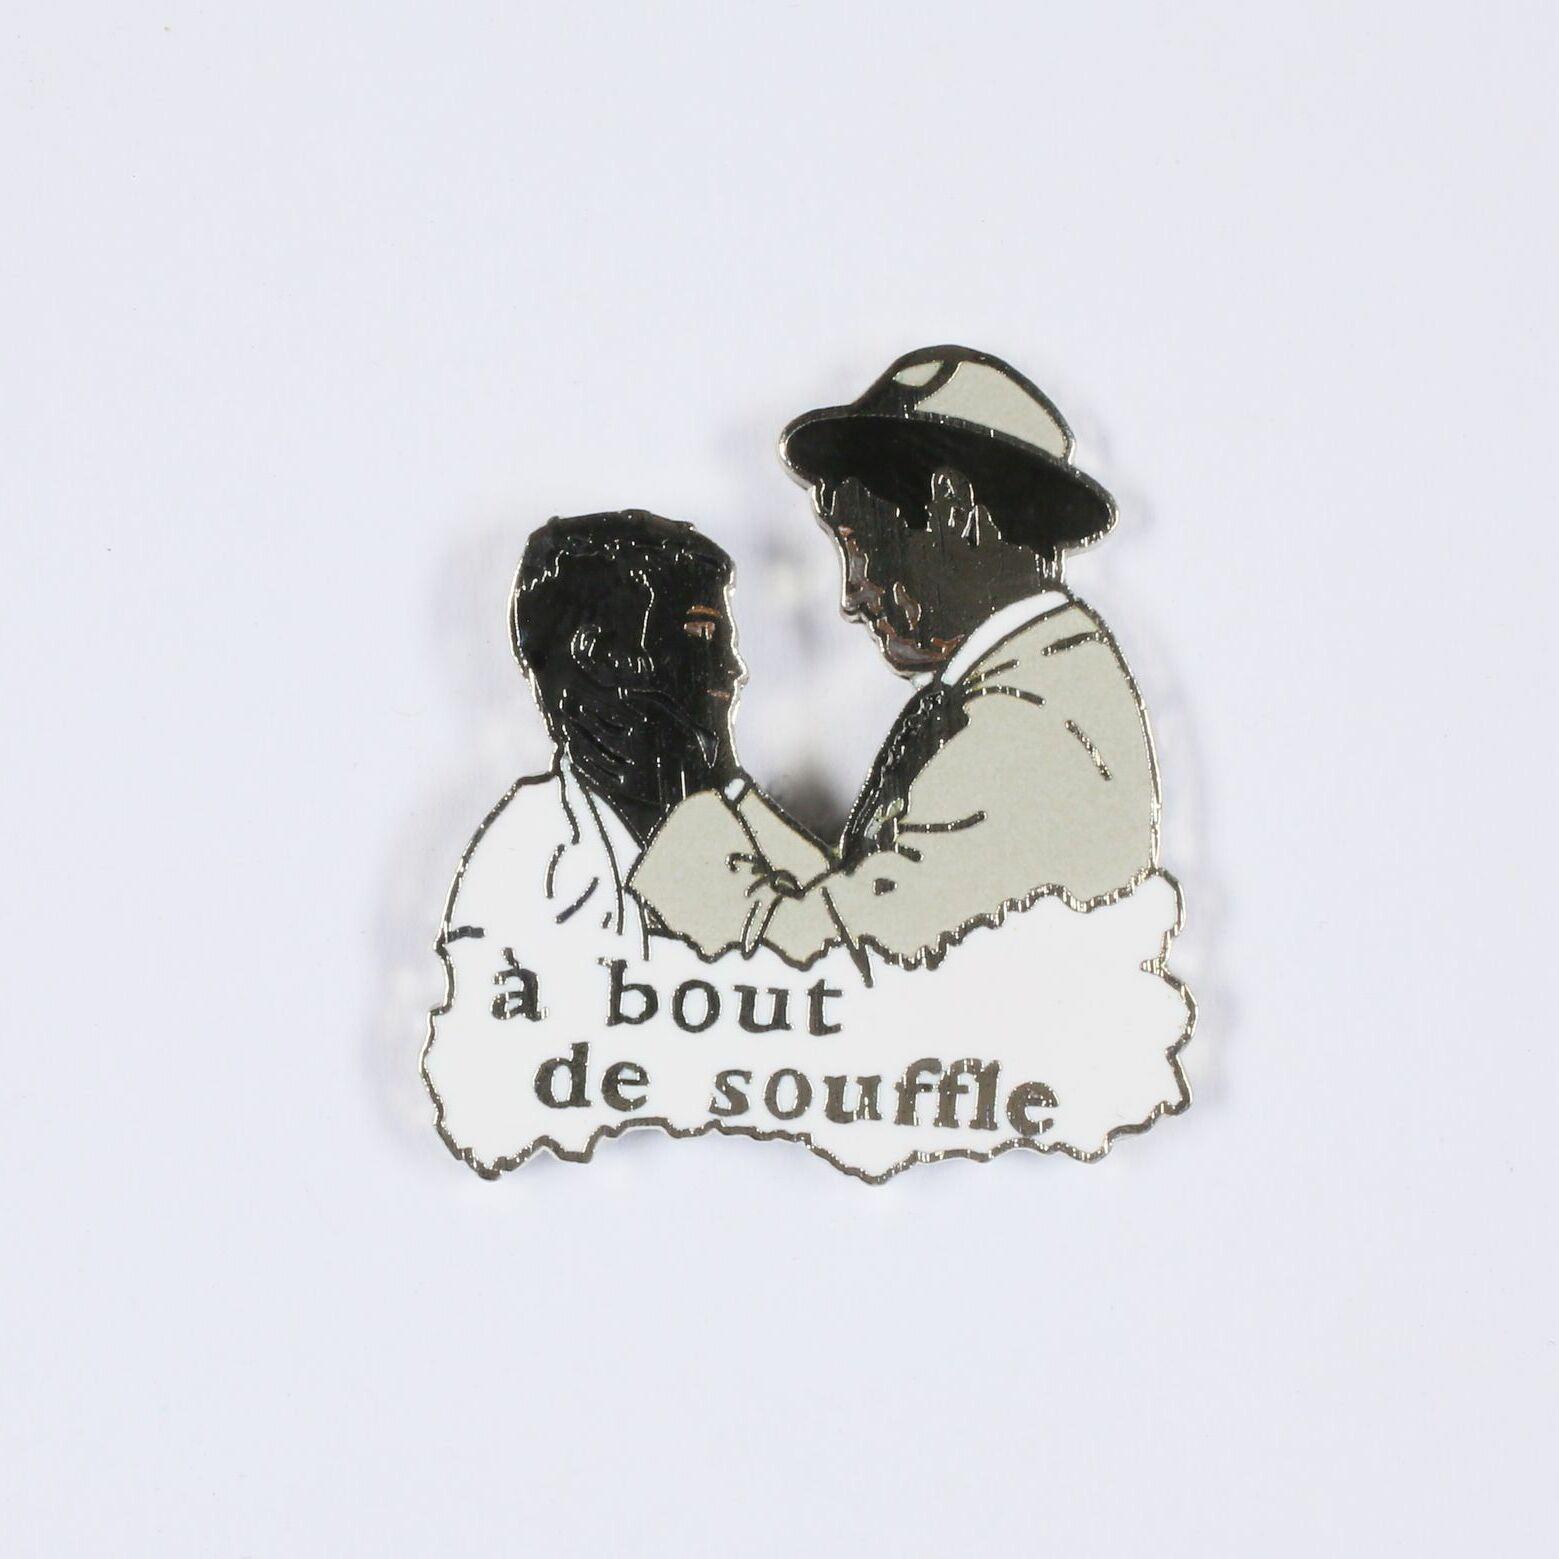 A bout de souffle, film de Jean-Luc Godard